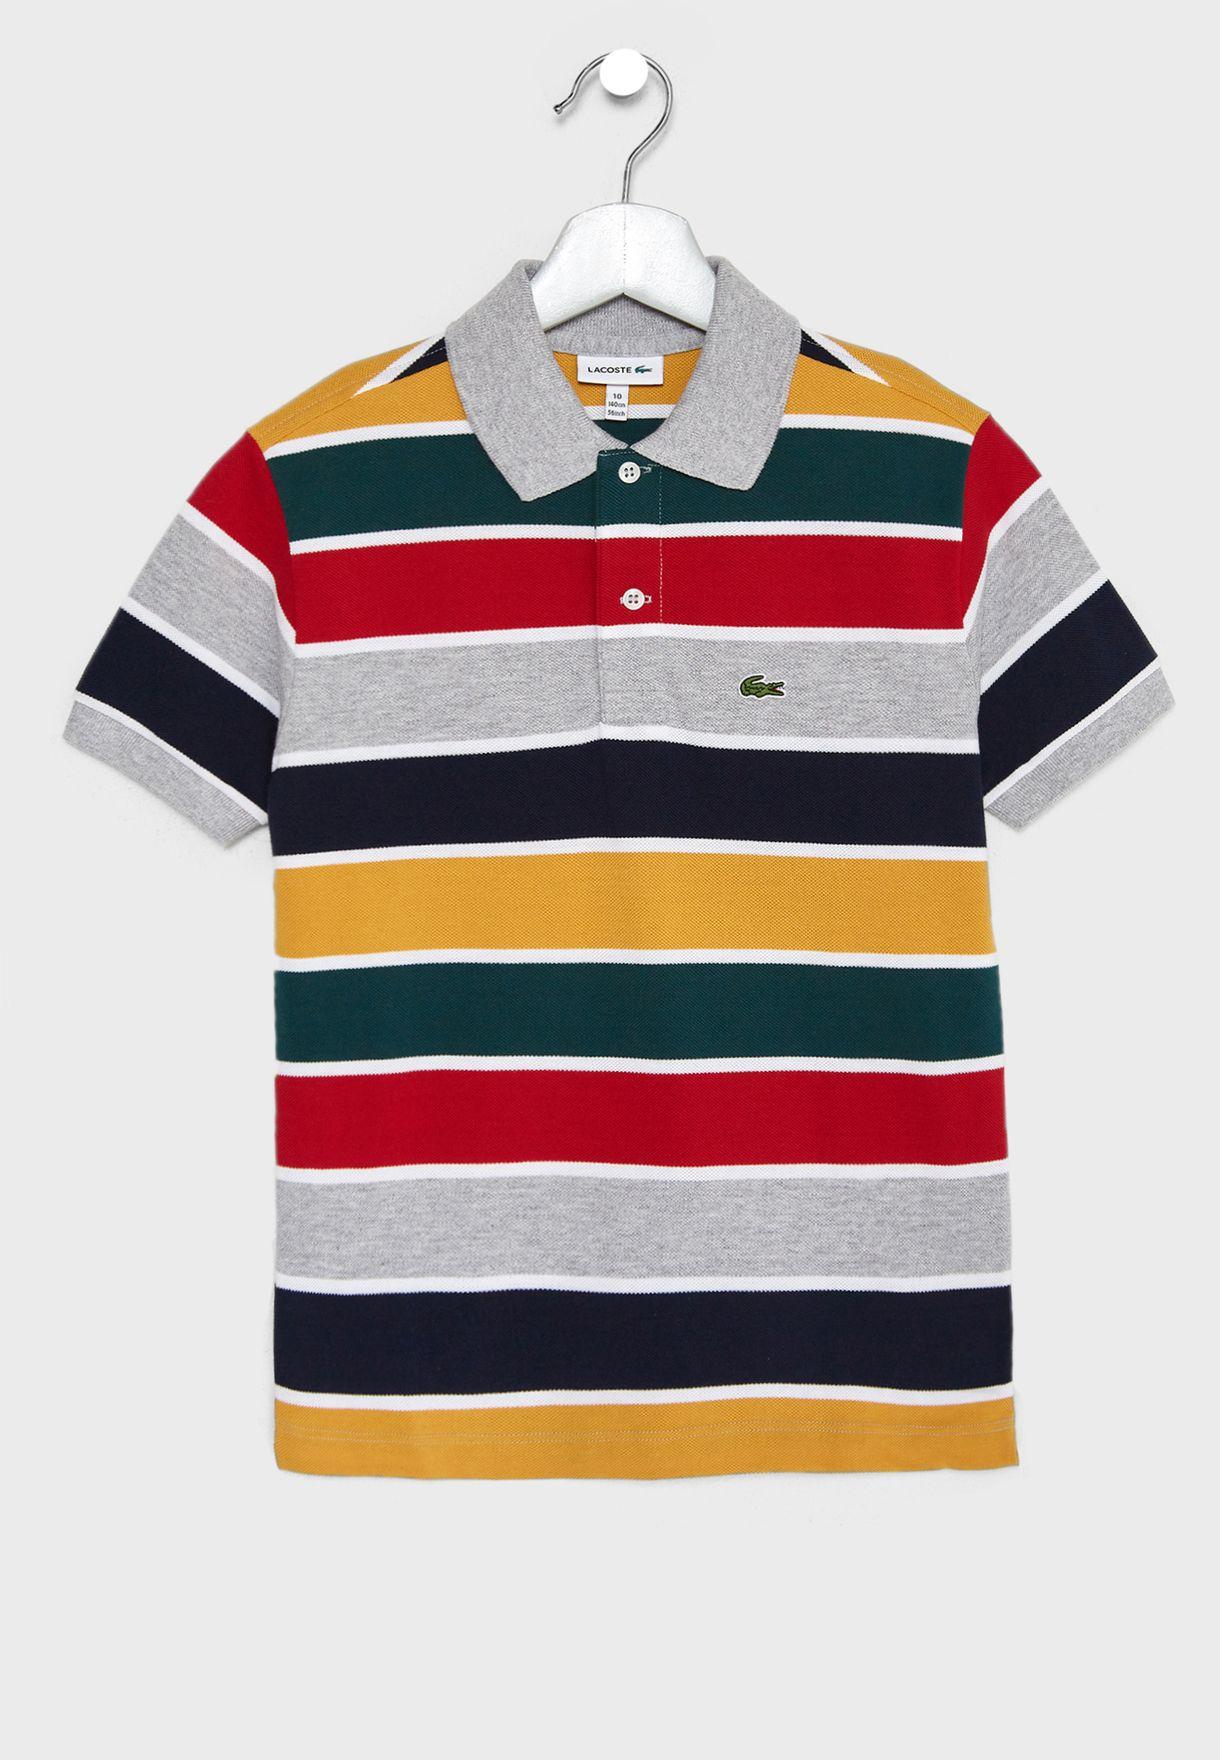 497a18fc4db7 Shop Lacoste multicolor Kids Striped Polo Shirt PJ9881-00-DJF for ...